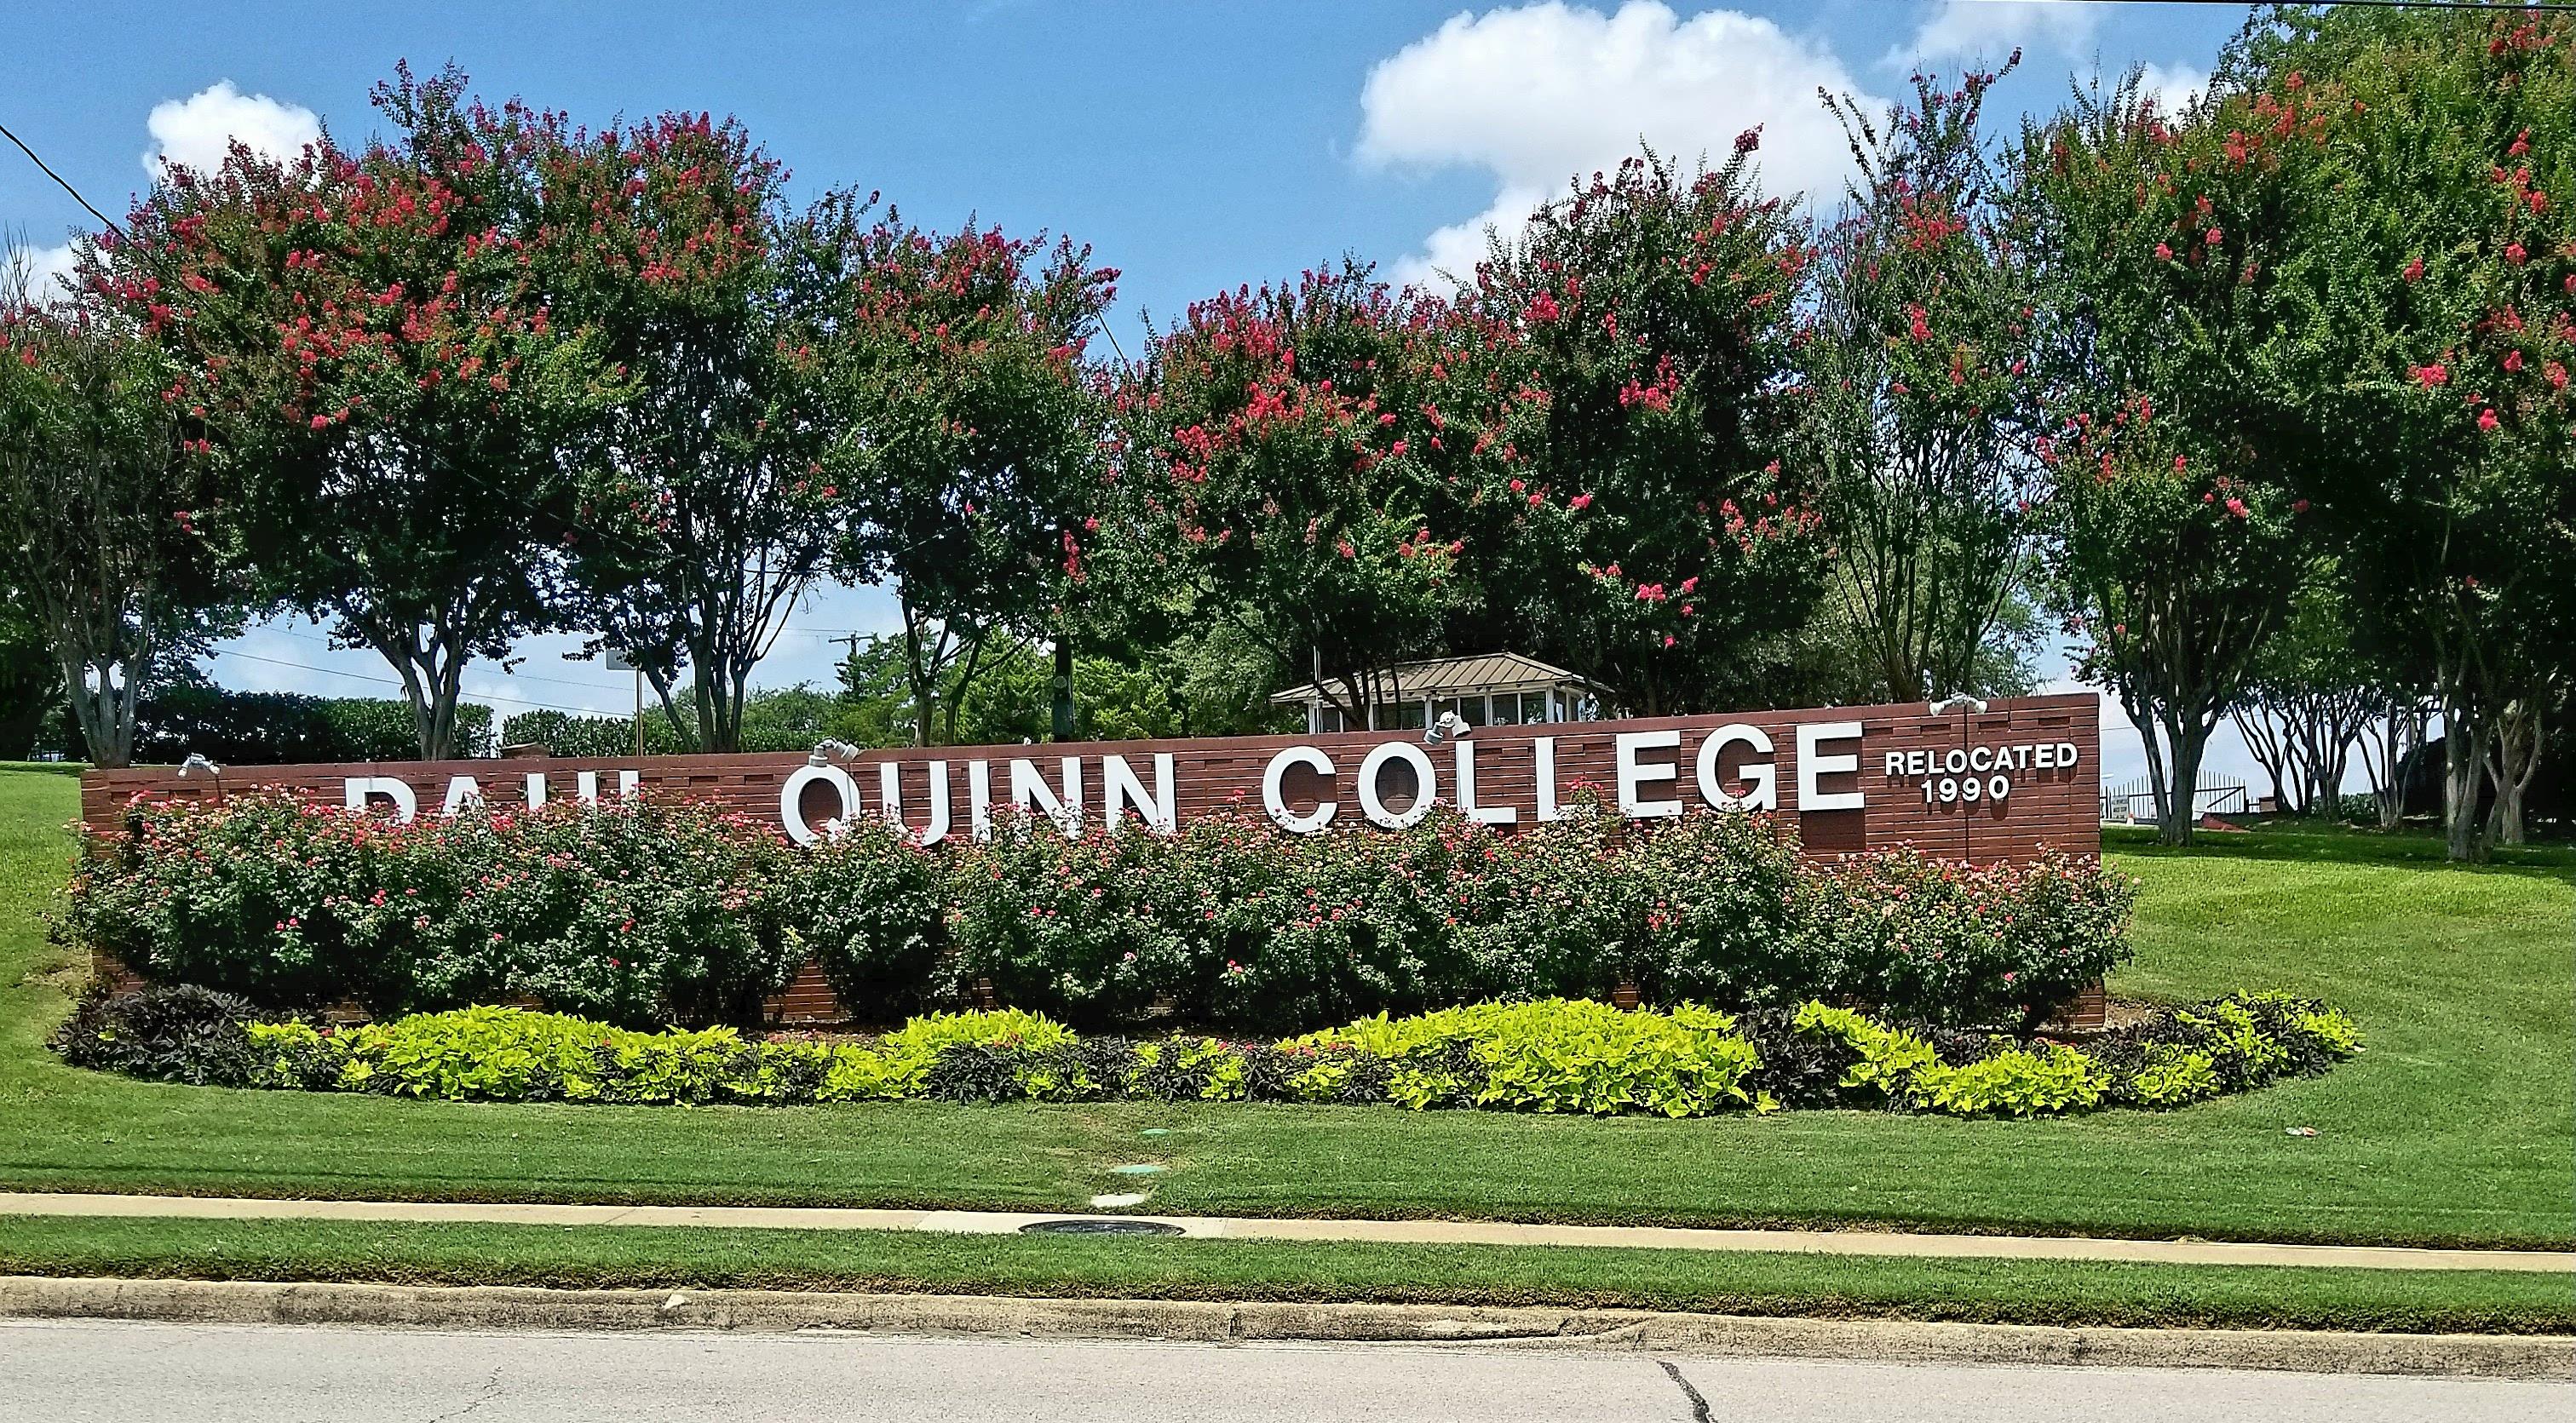 Strada-1-Million-Paul-Quinn-College-Plano_CAEL-in-the-News_2018.jpg